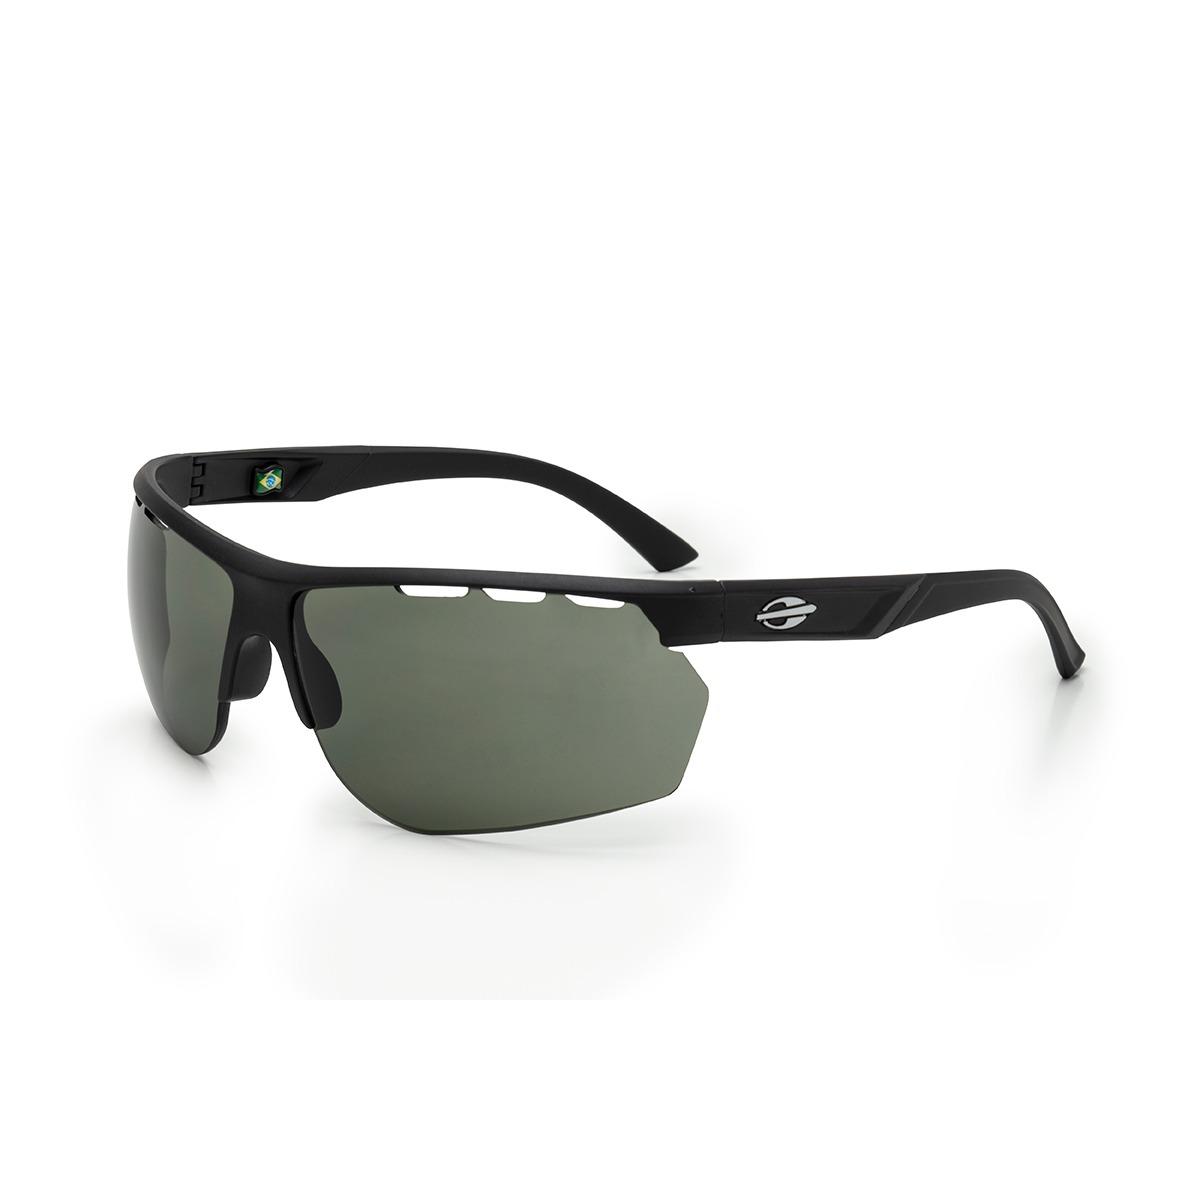 1971940bd1570 óculos de sol mormaii thunder masculino preto m0078a1471. Carregando zoom.